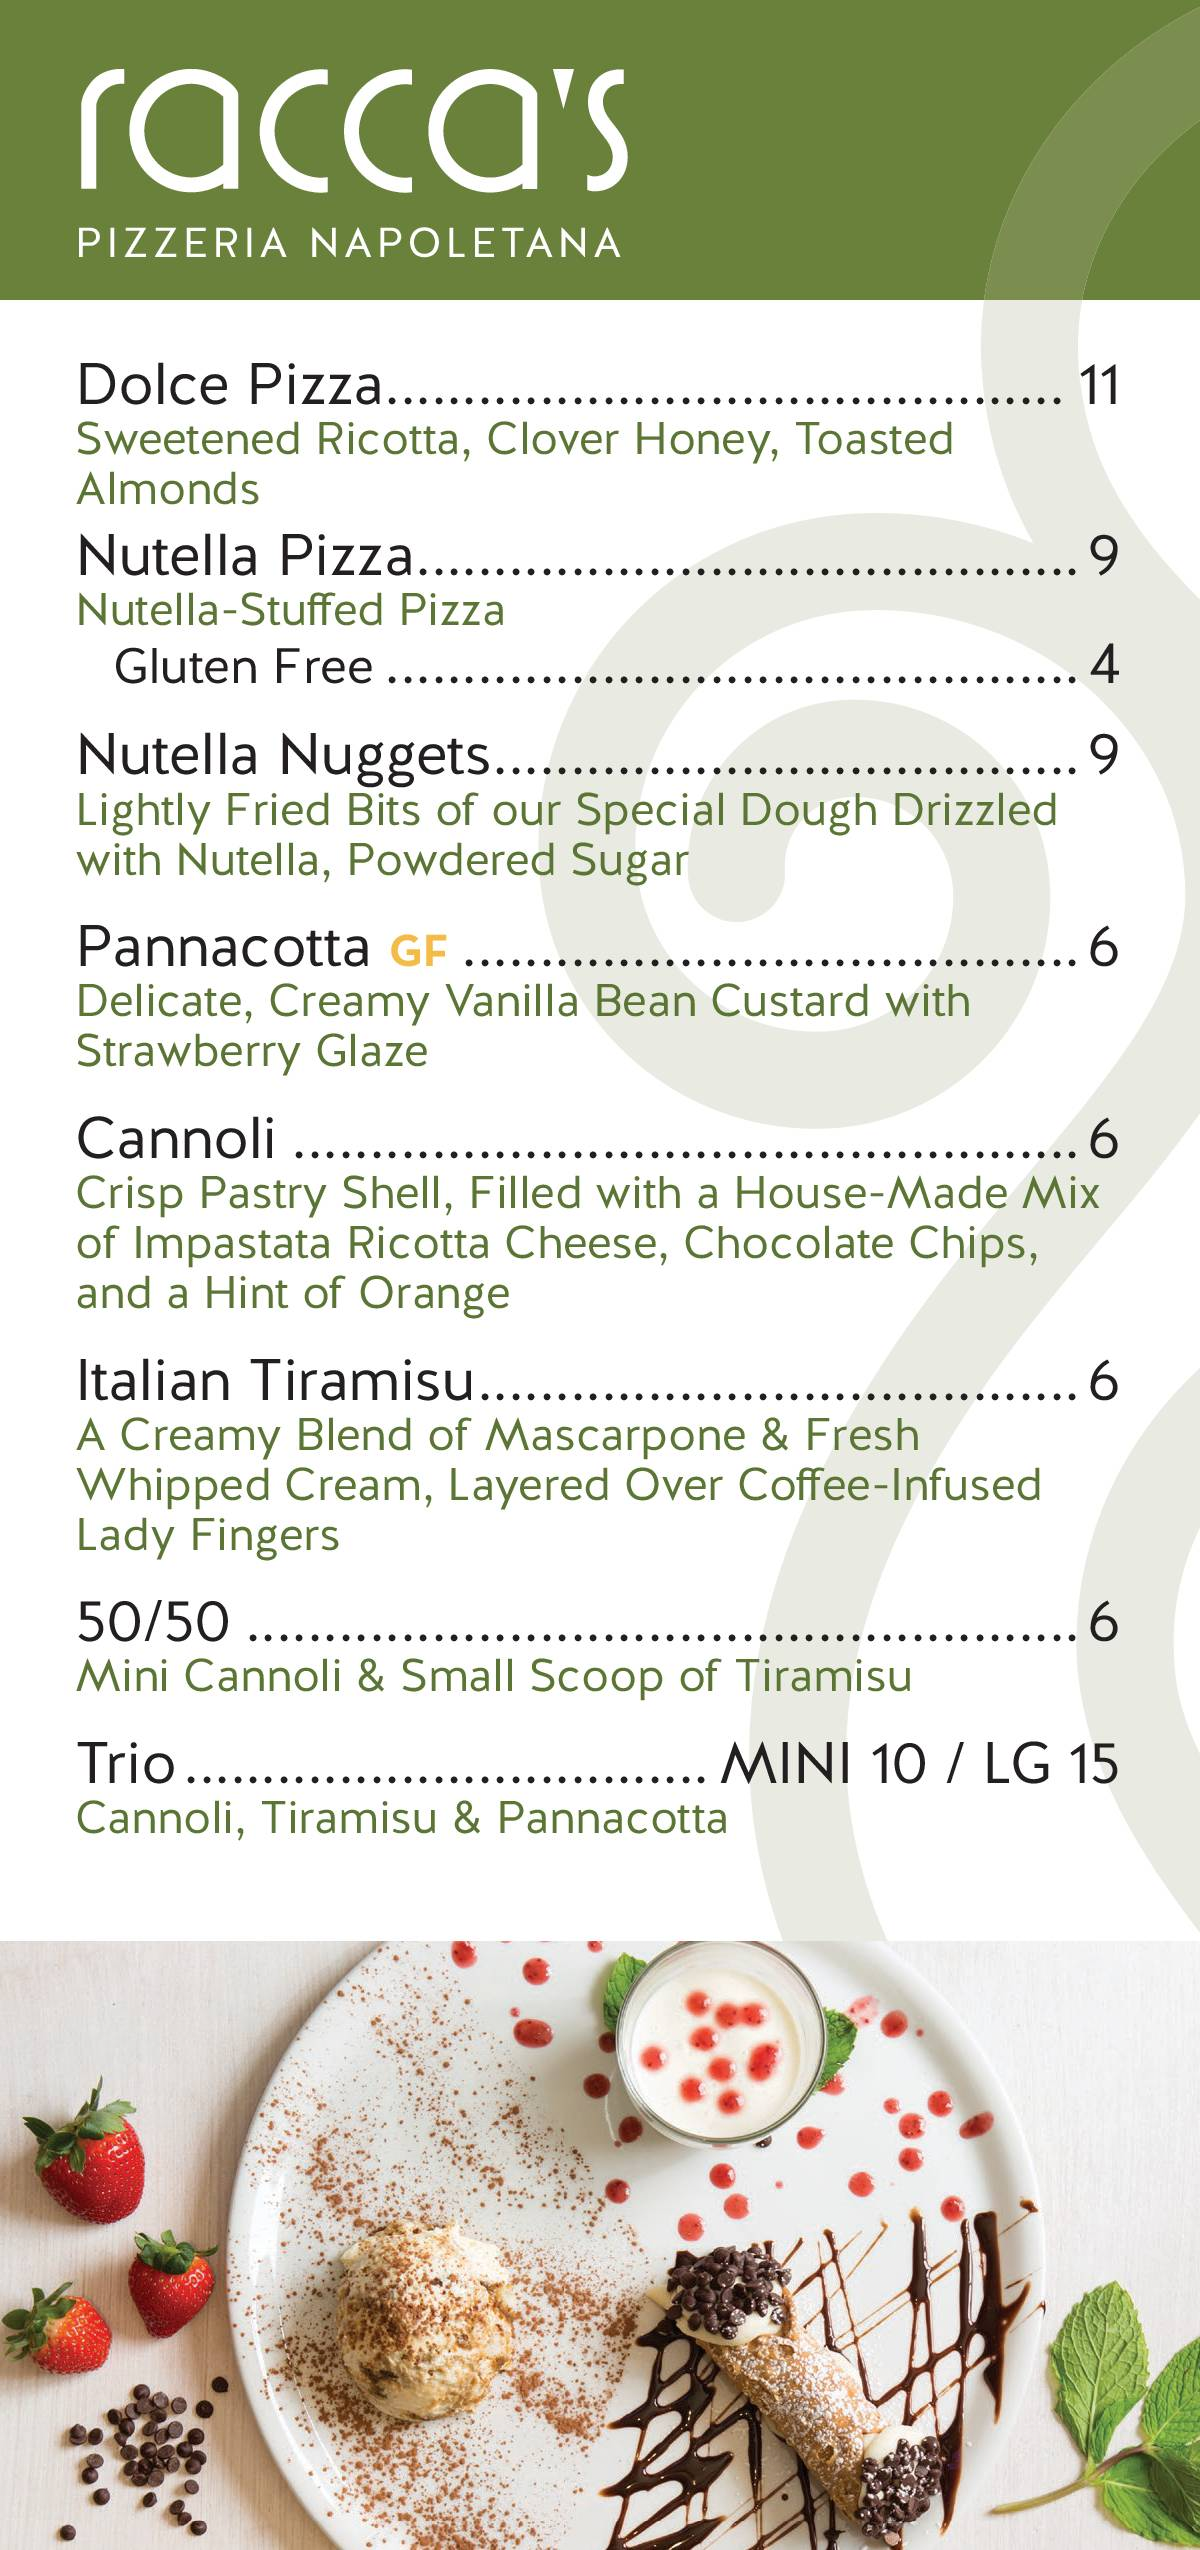 Dessert Menu 2019 - Racca's Pizzeria Napoletana